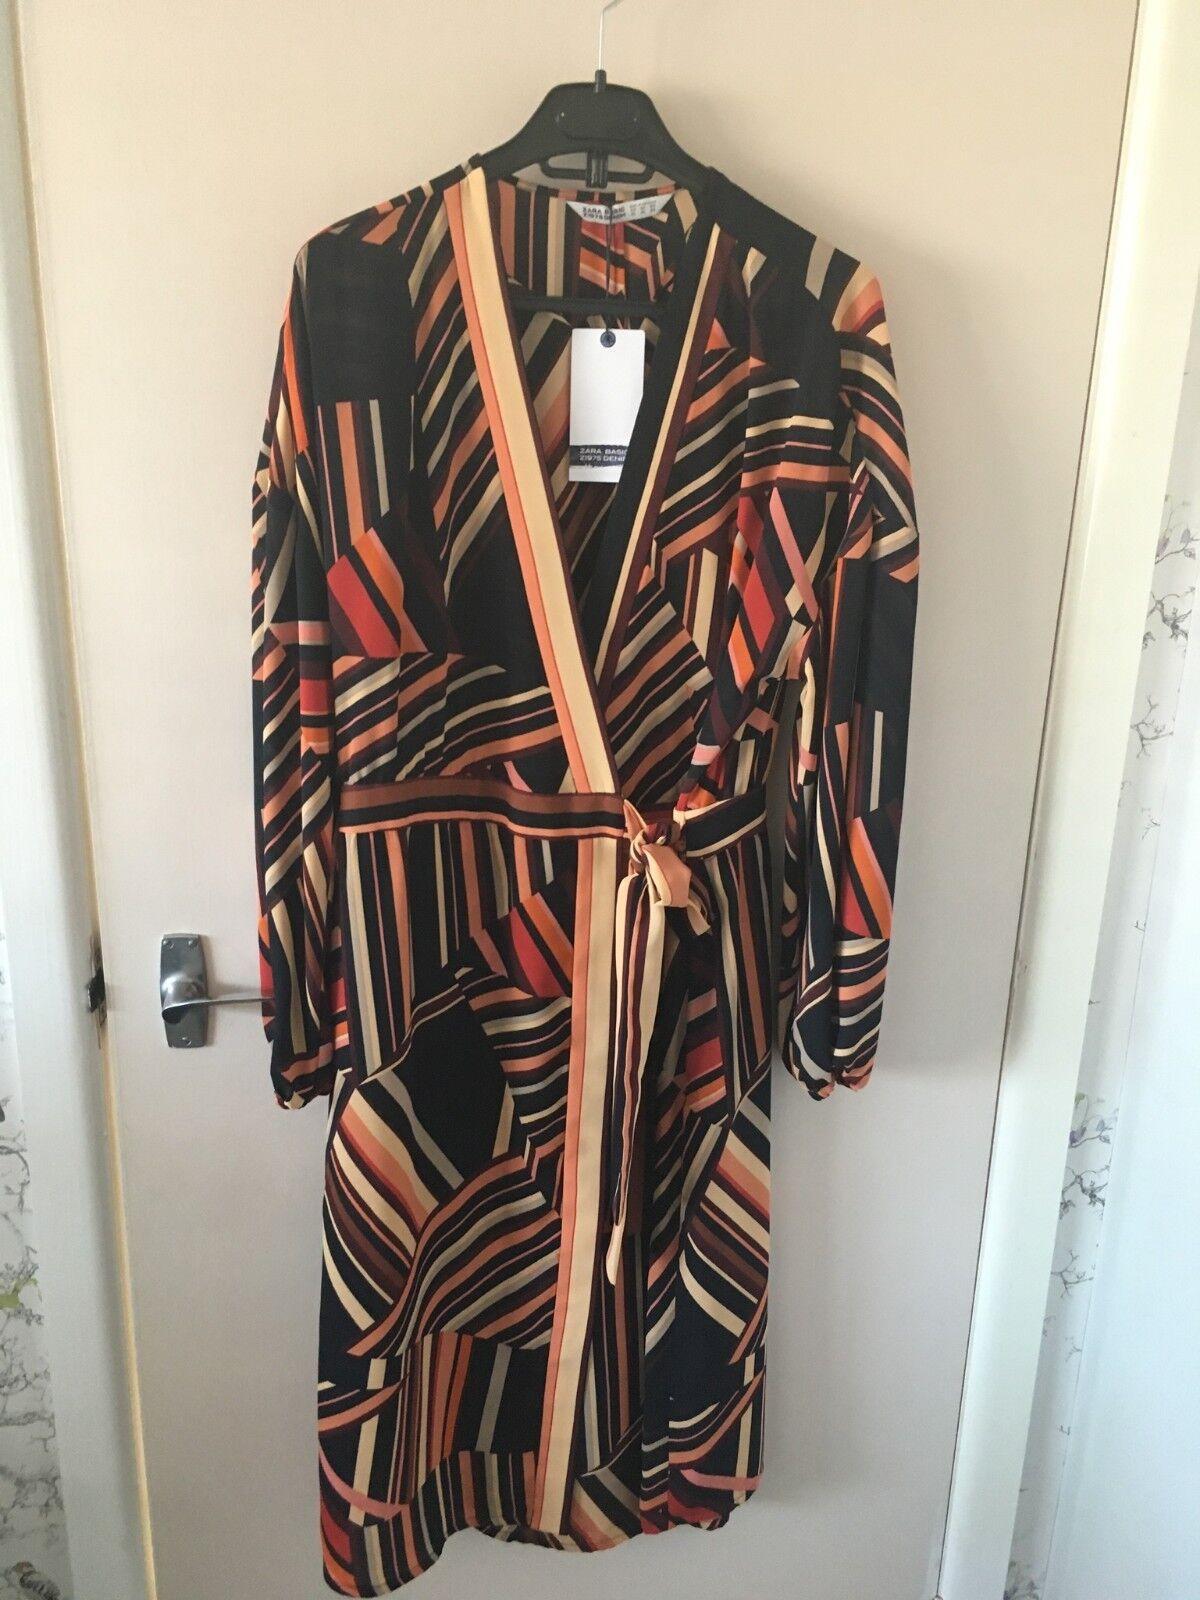 BNWT ZARA Striped Long Sleeve Sarong Dress Size XL